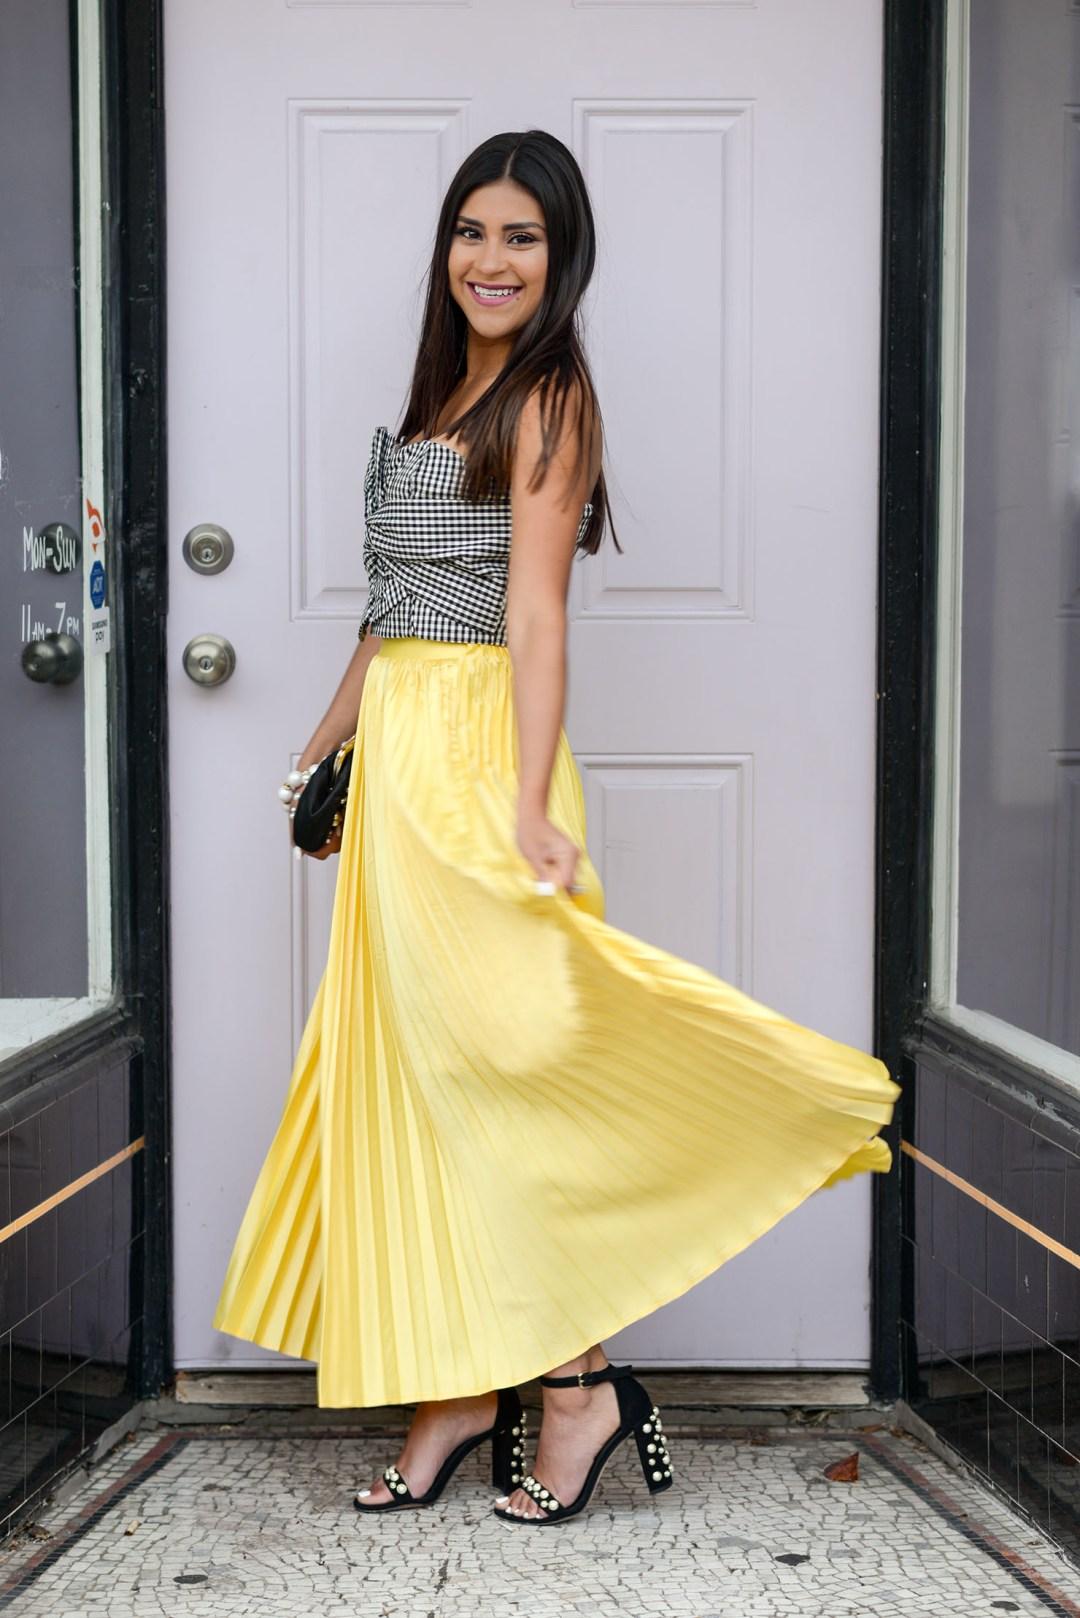 Lifestyle blogger Kelsey Kaplan of Kelsey Kaplan Fashion wearing pearl Stuart Weitzman sandals for Kentucky Derby